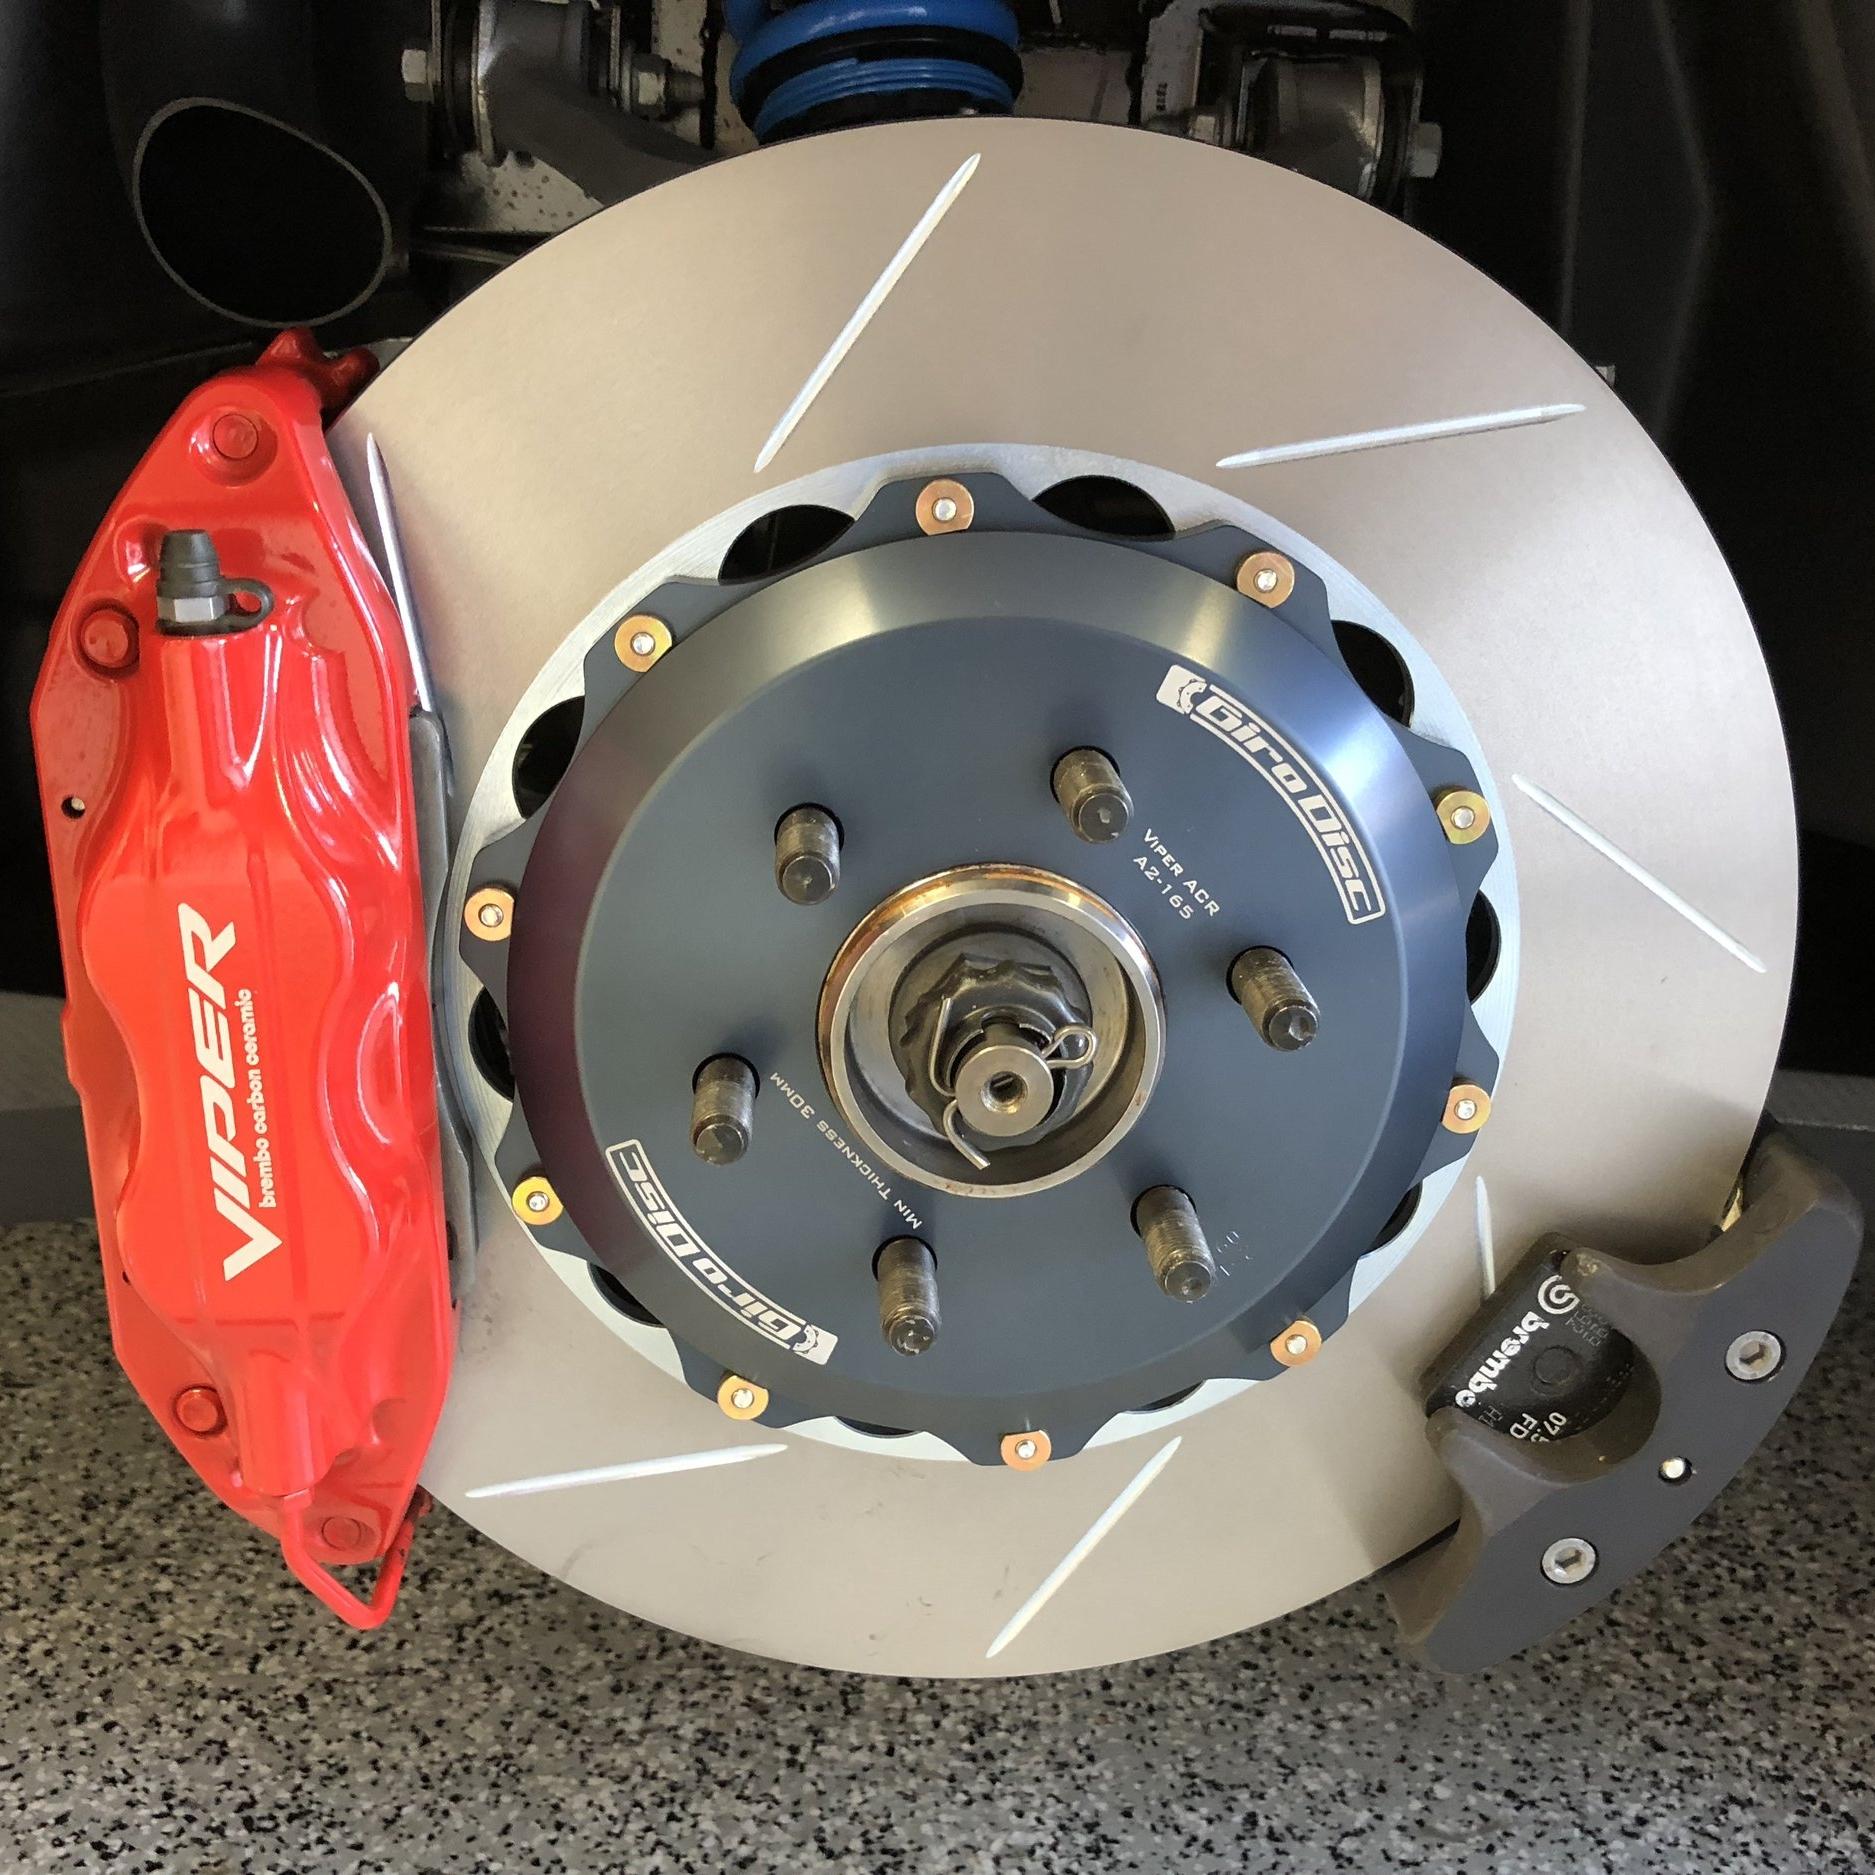 Girodisc ACR-E installed rear